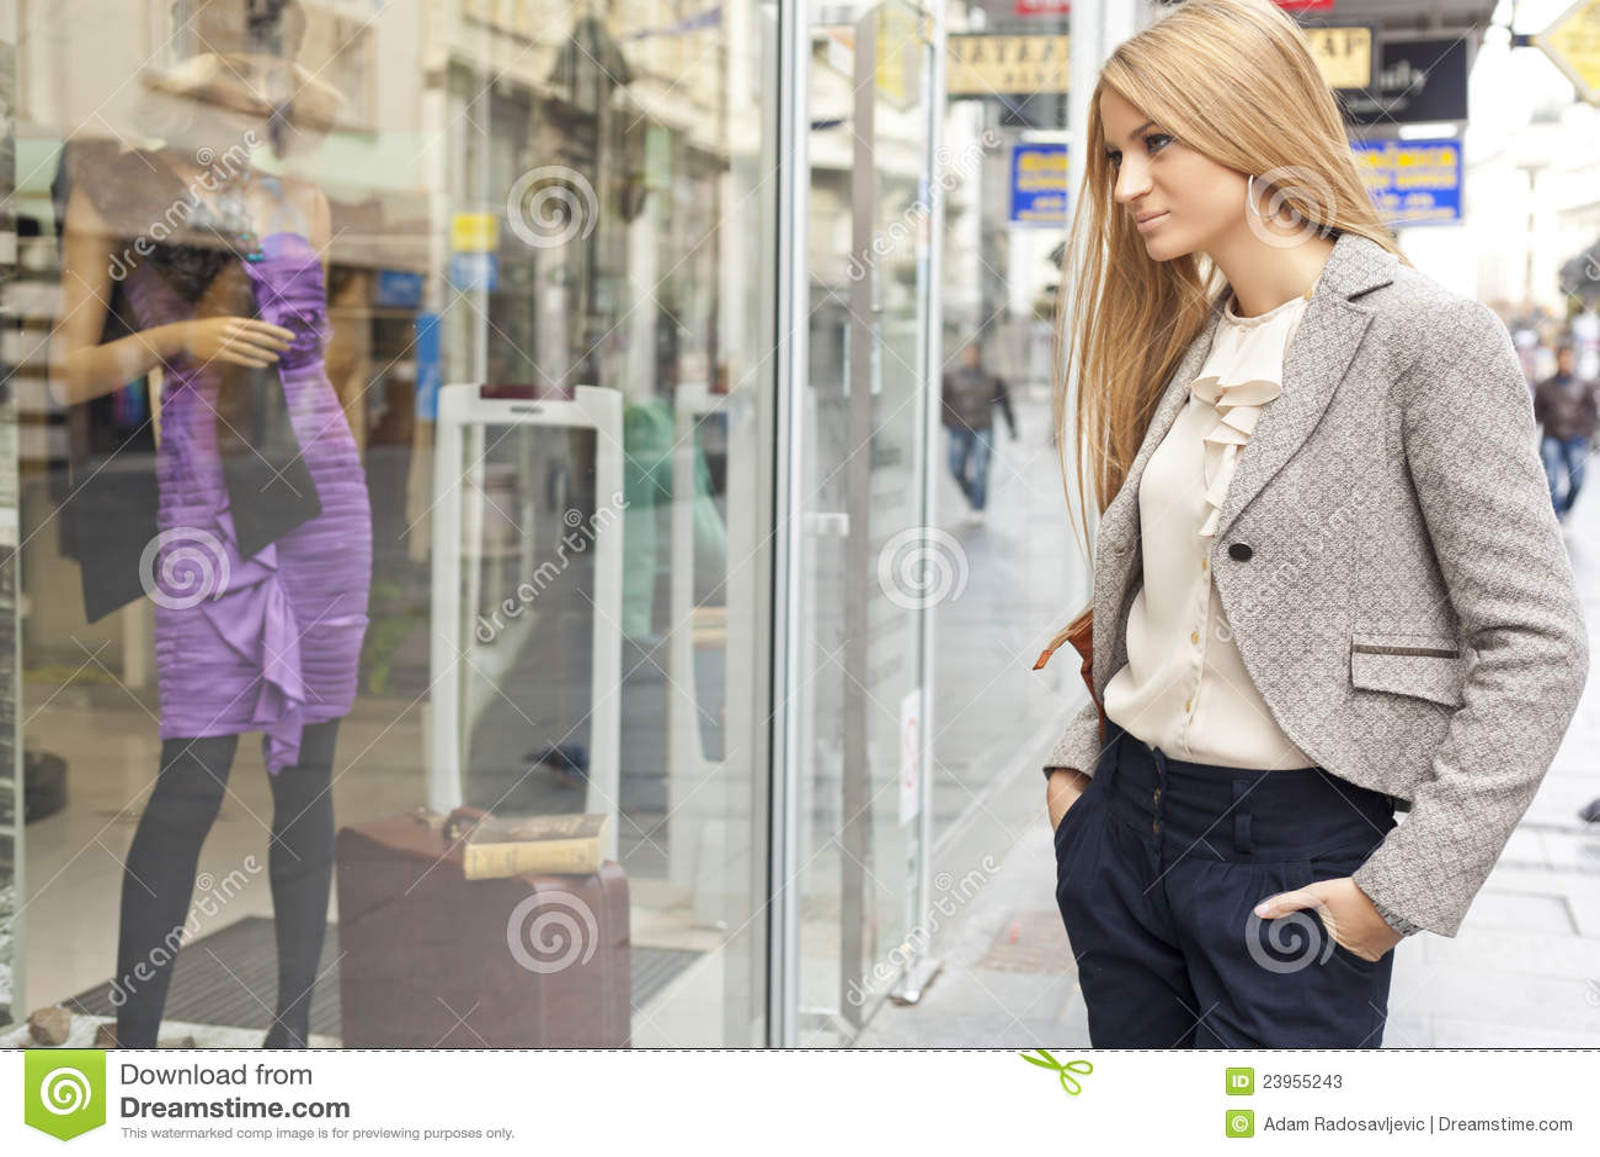 Femme dans la rue shoping regardant l hublot